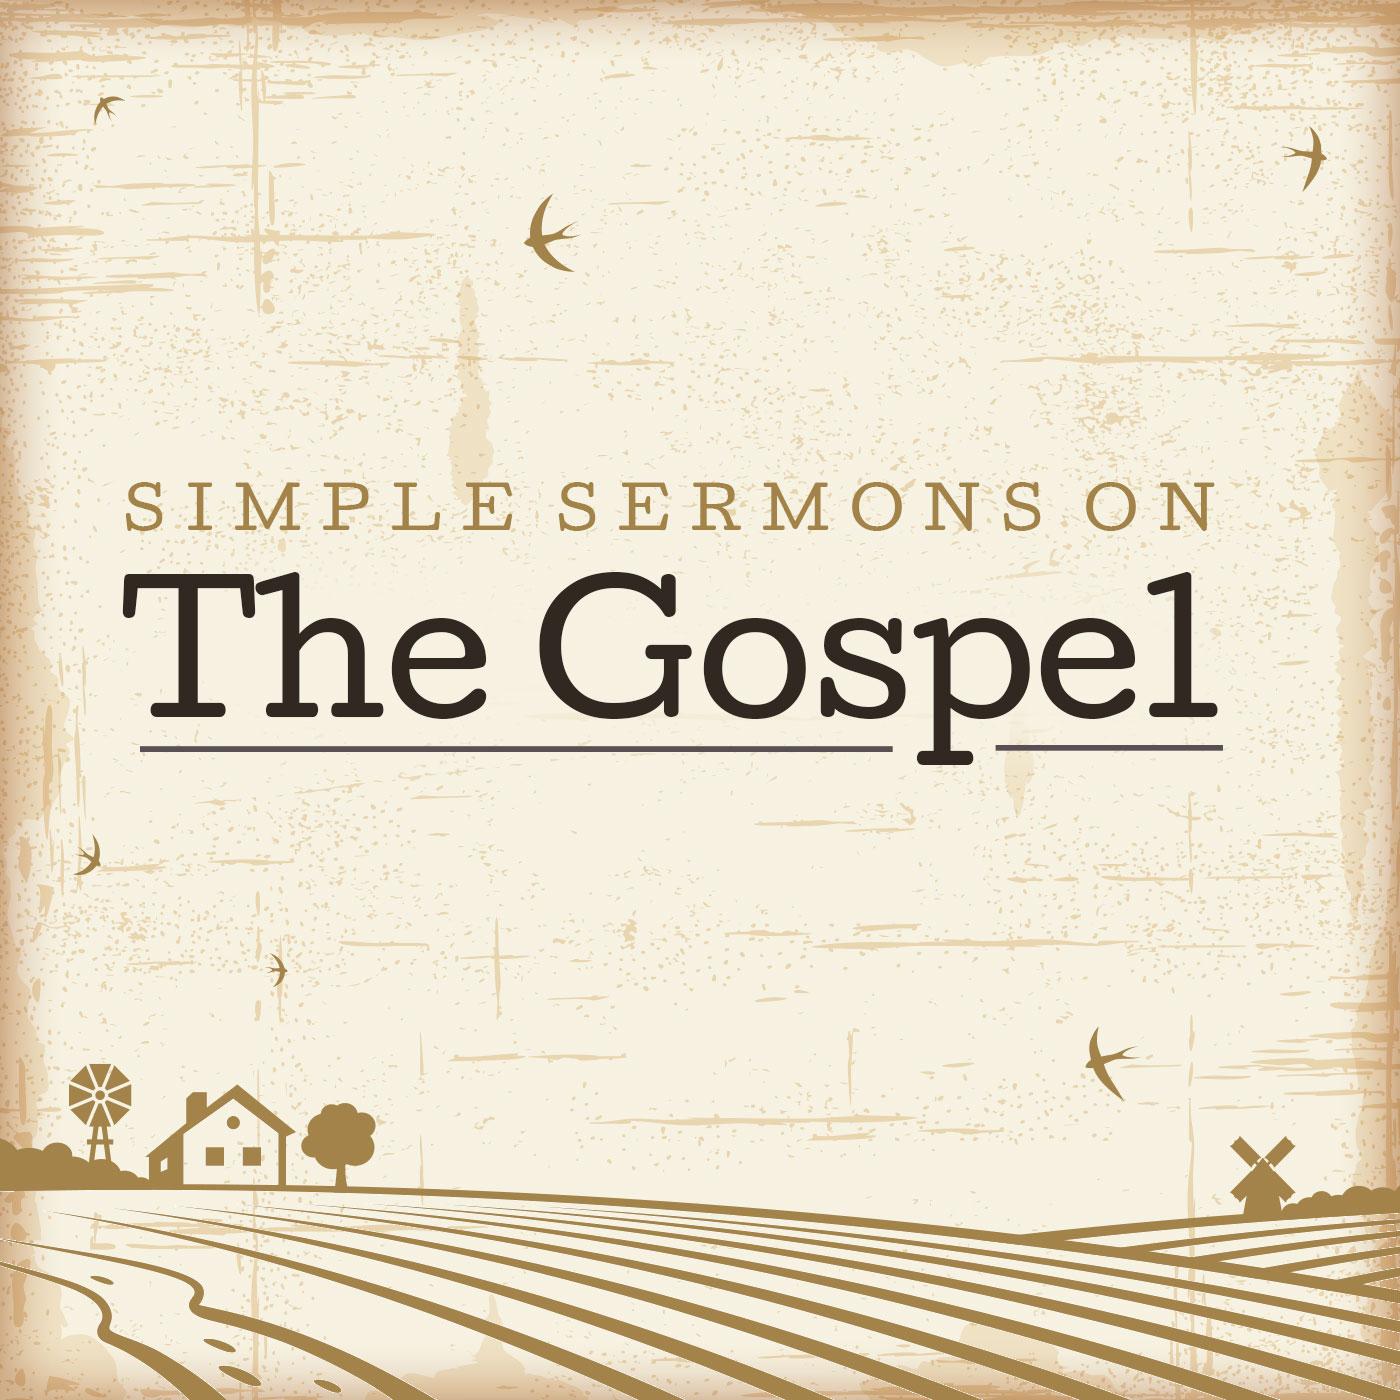 Simple Sermons On The Gospel